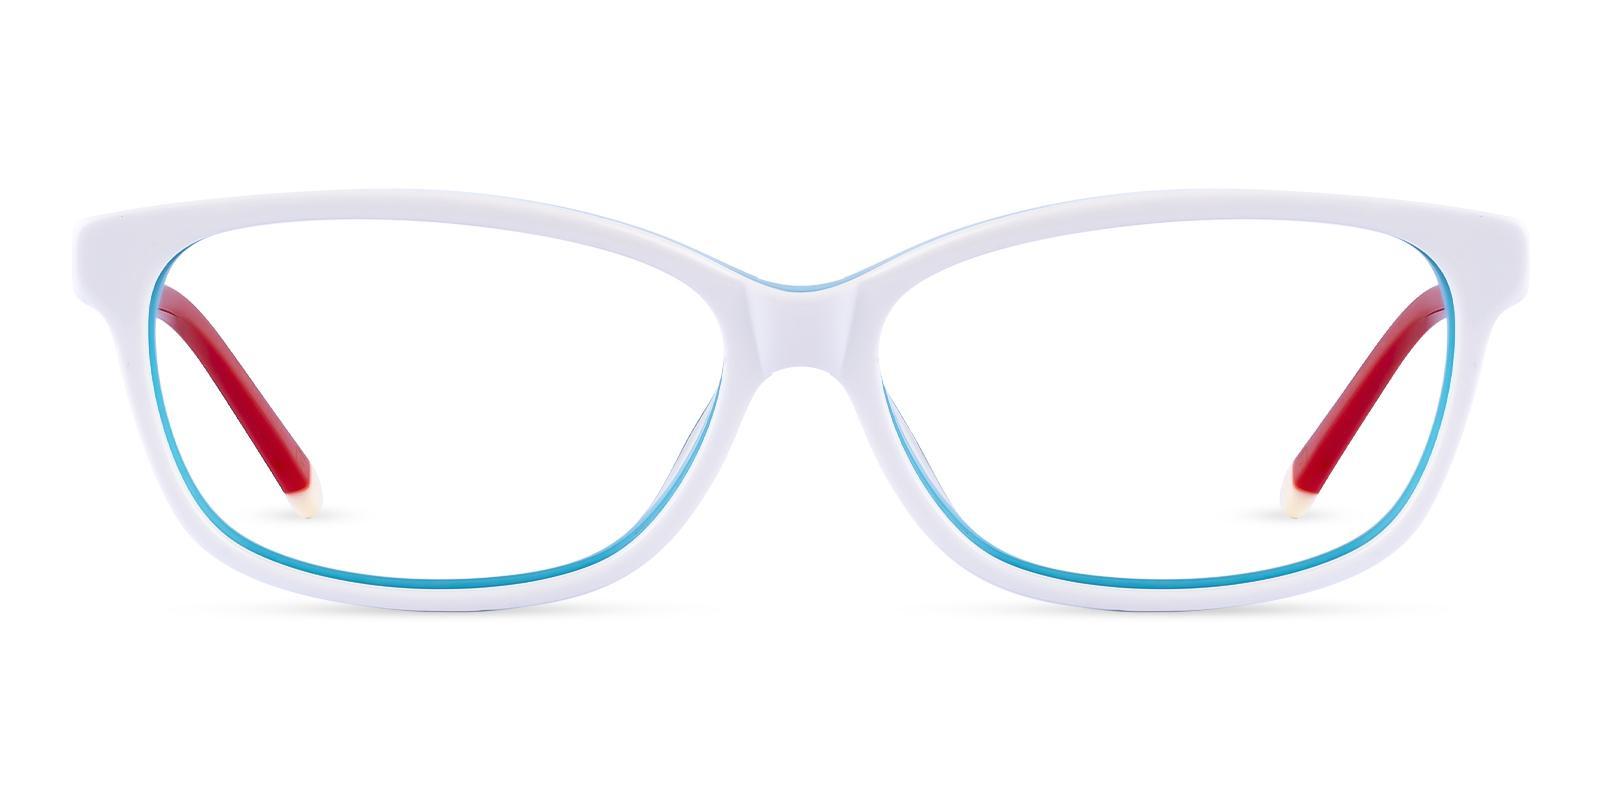 Cyprus White Acetate Eyeglasses , SpringHinges , UniversalBridgeFit Frames from ABBE Glasses